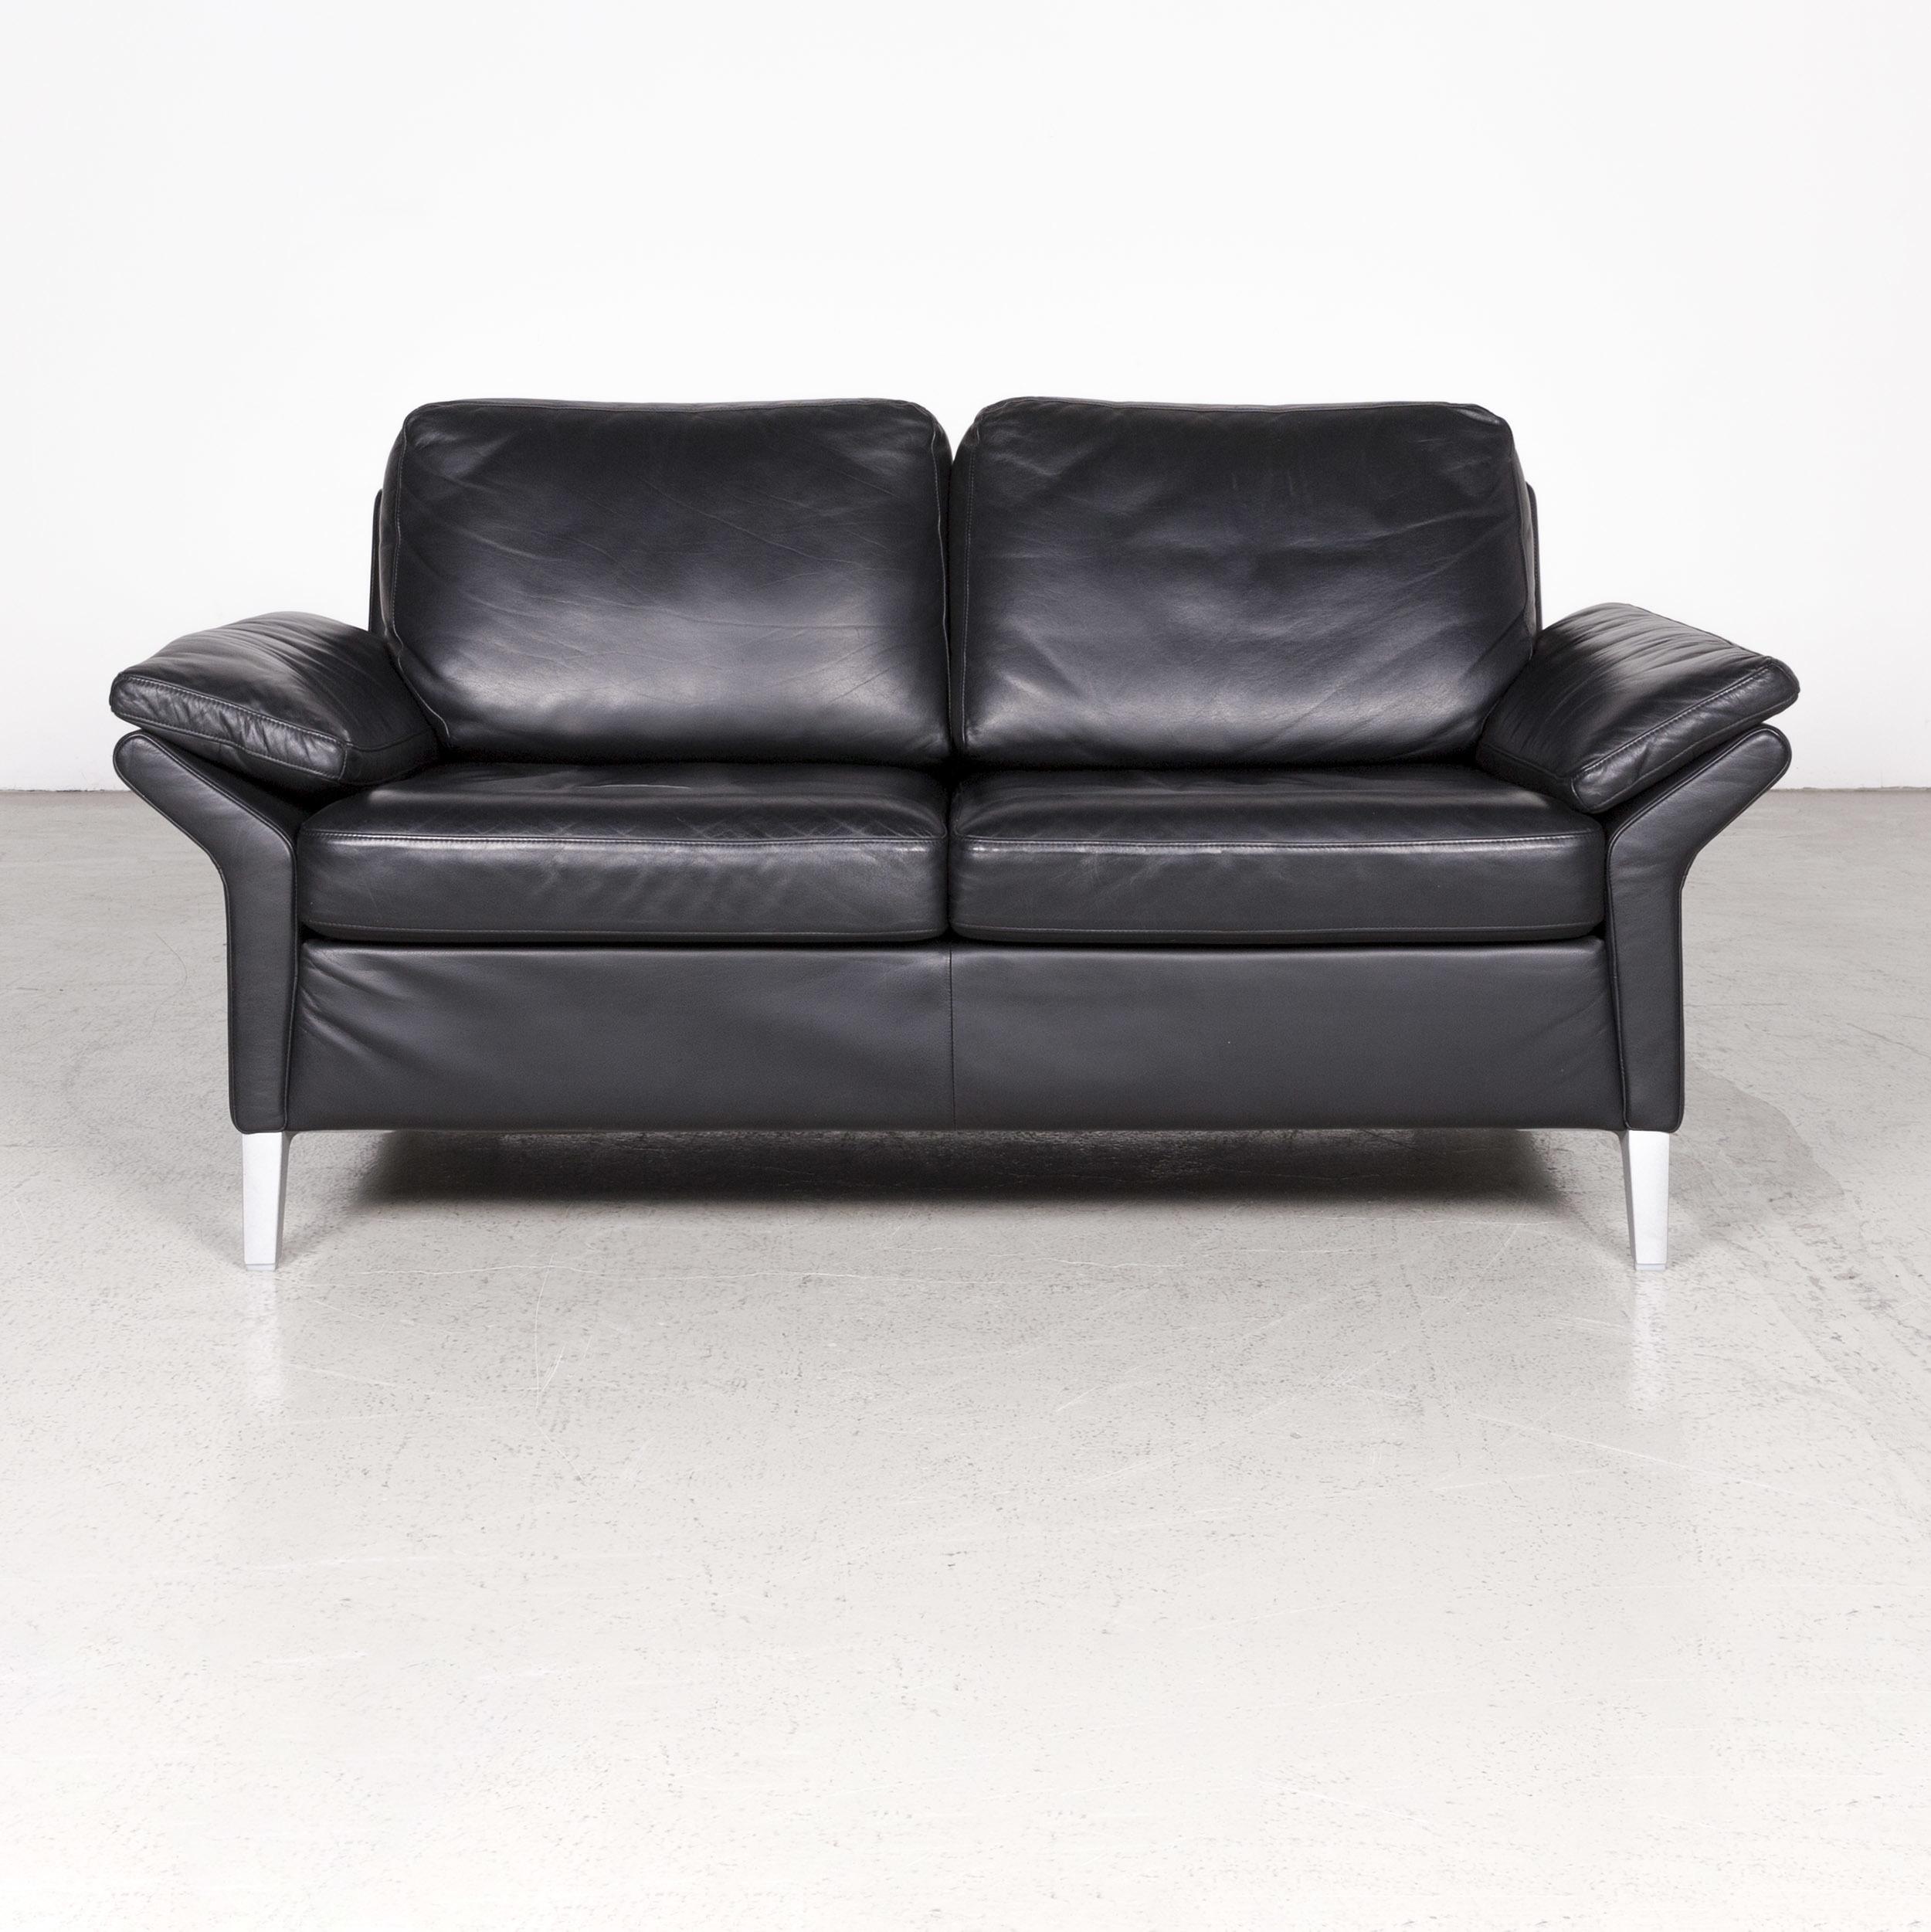 Leather Sofa Black Genuine